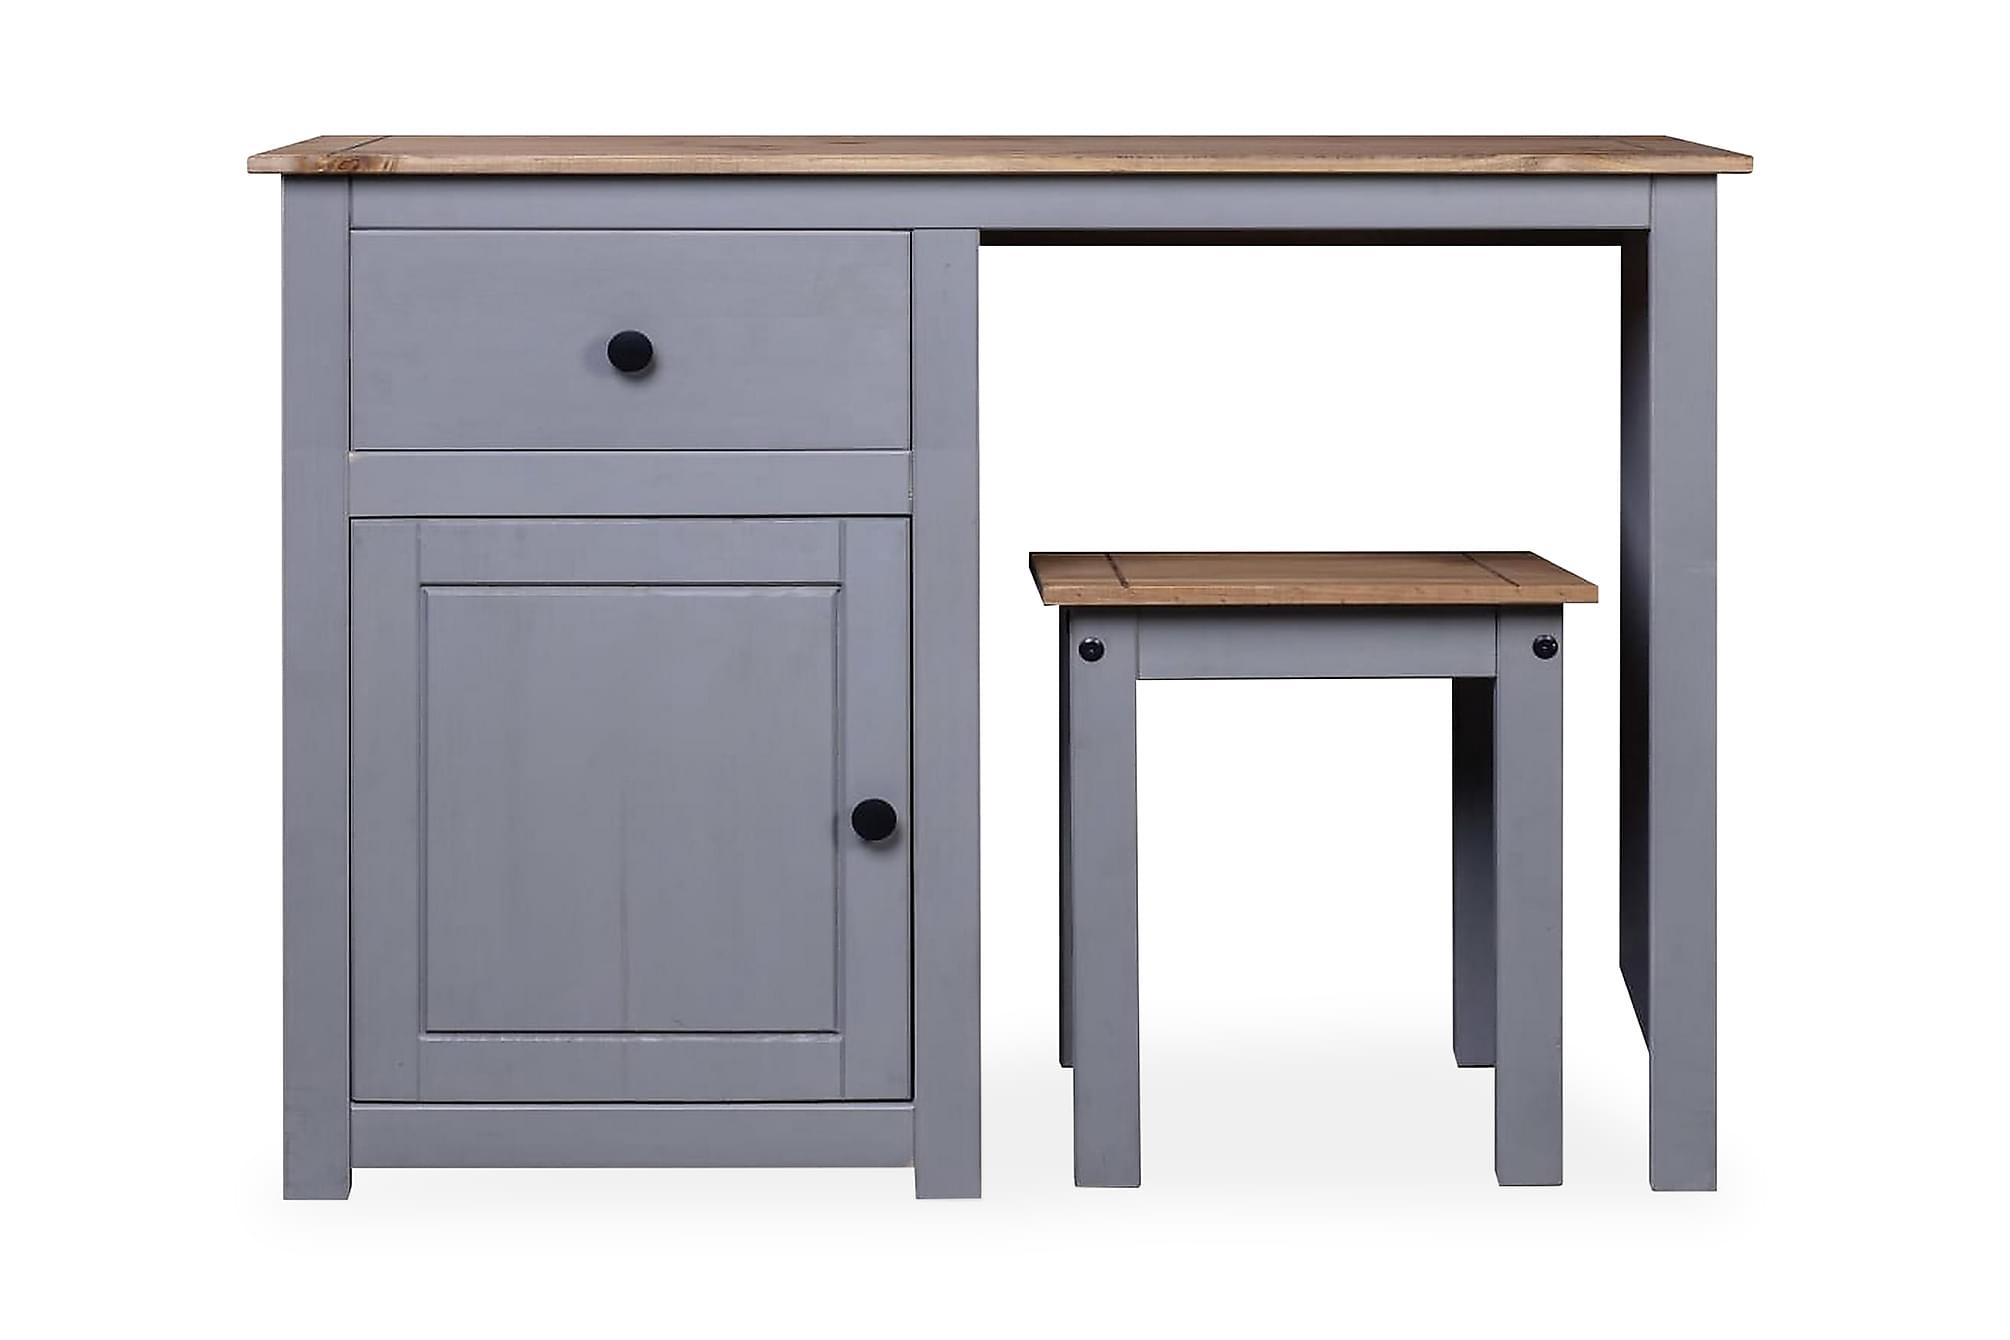 Sminkbord set 2 delar grå massiv furu panama